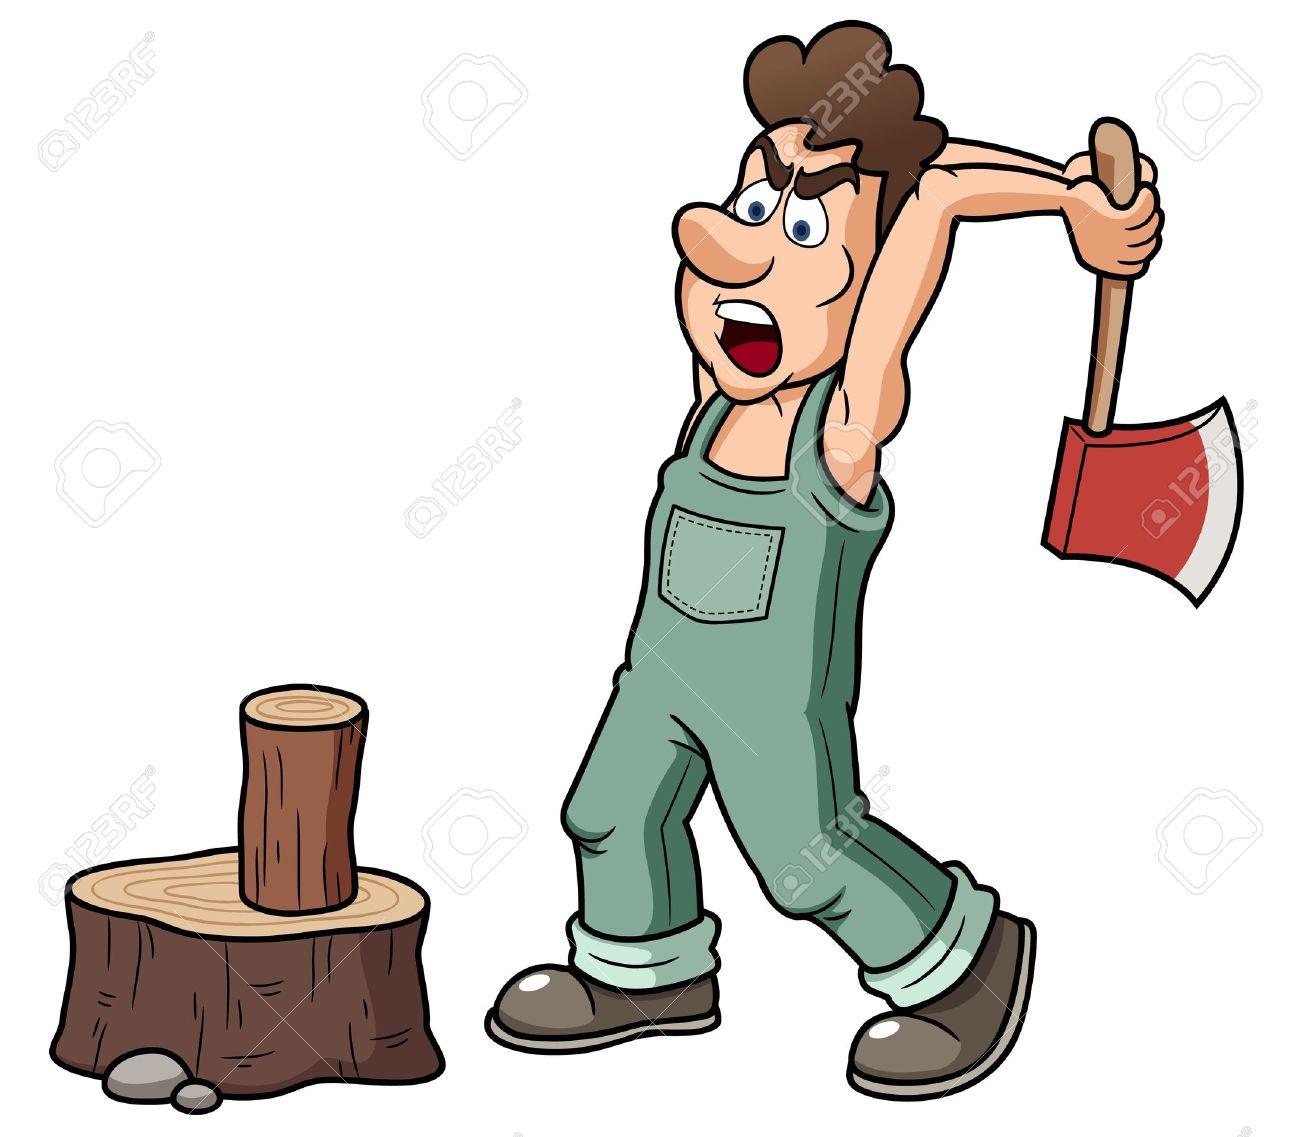 Illustration Of Man Chopping Wood Royalty Free Cliparts, Vectors.